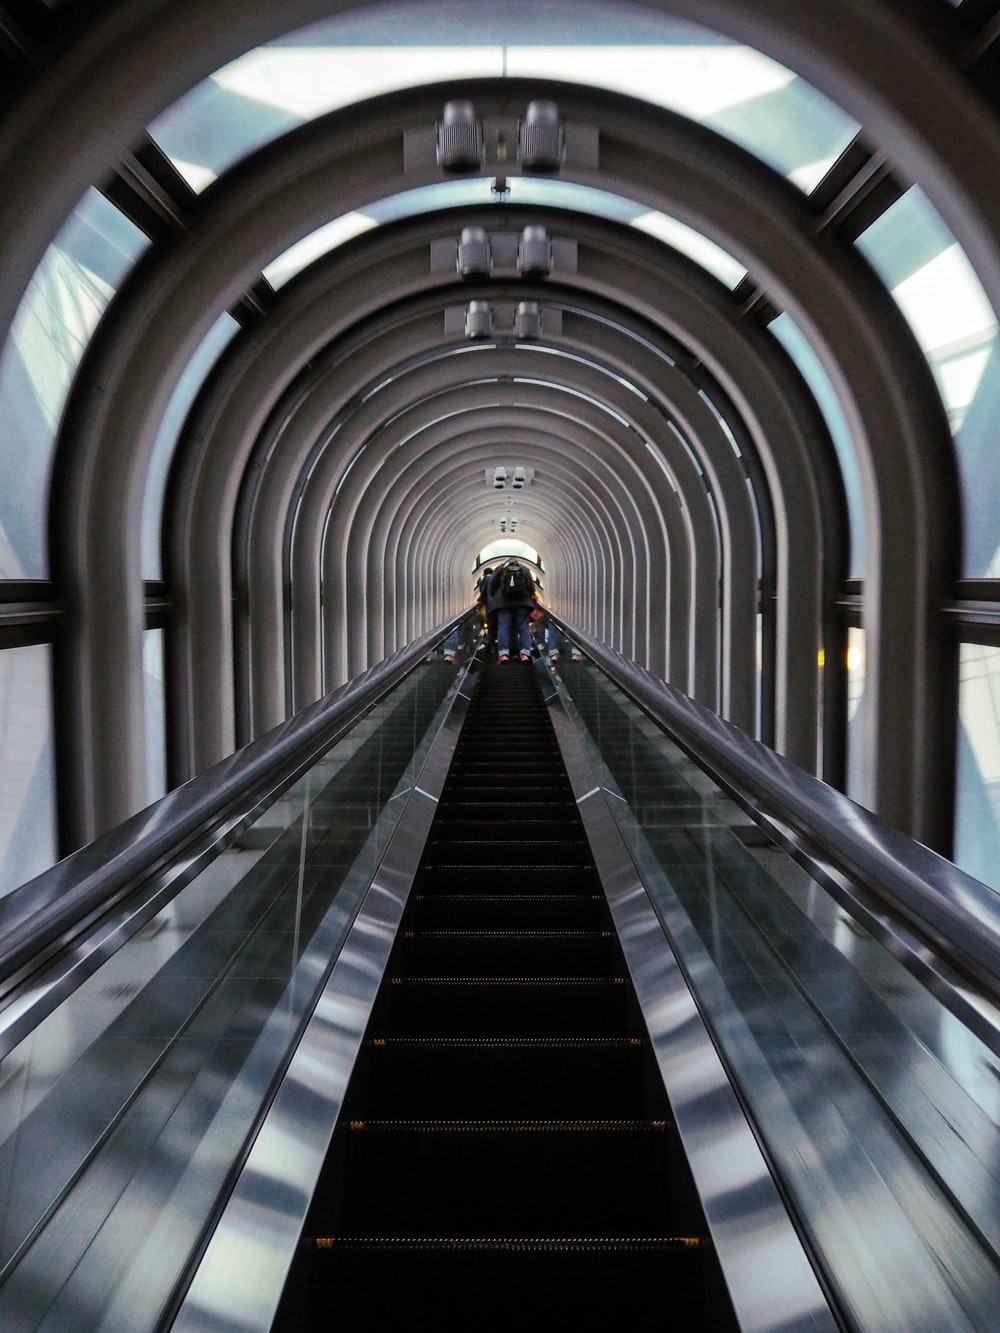 person standing on escalator